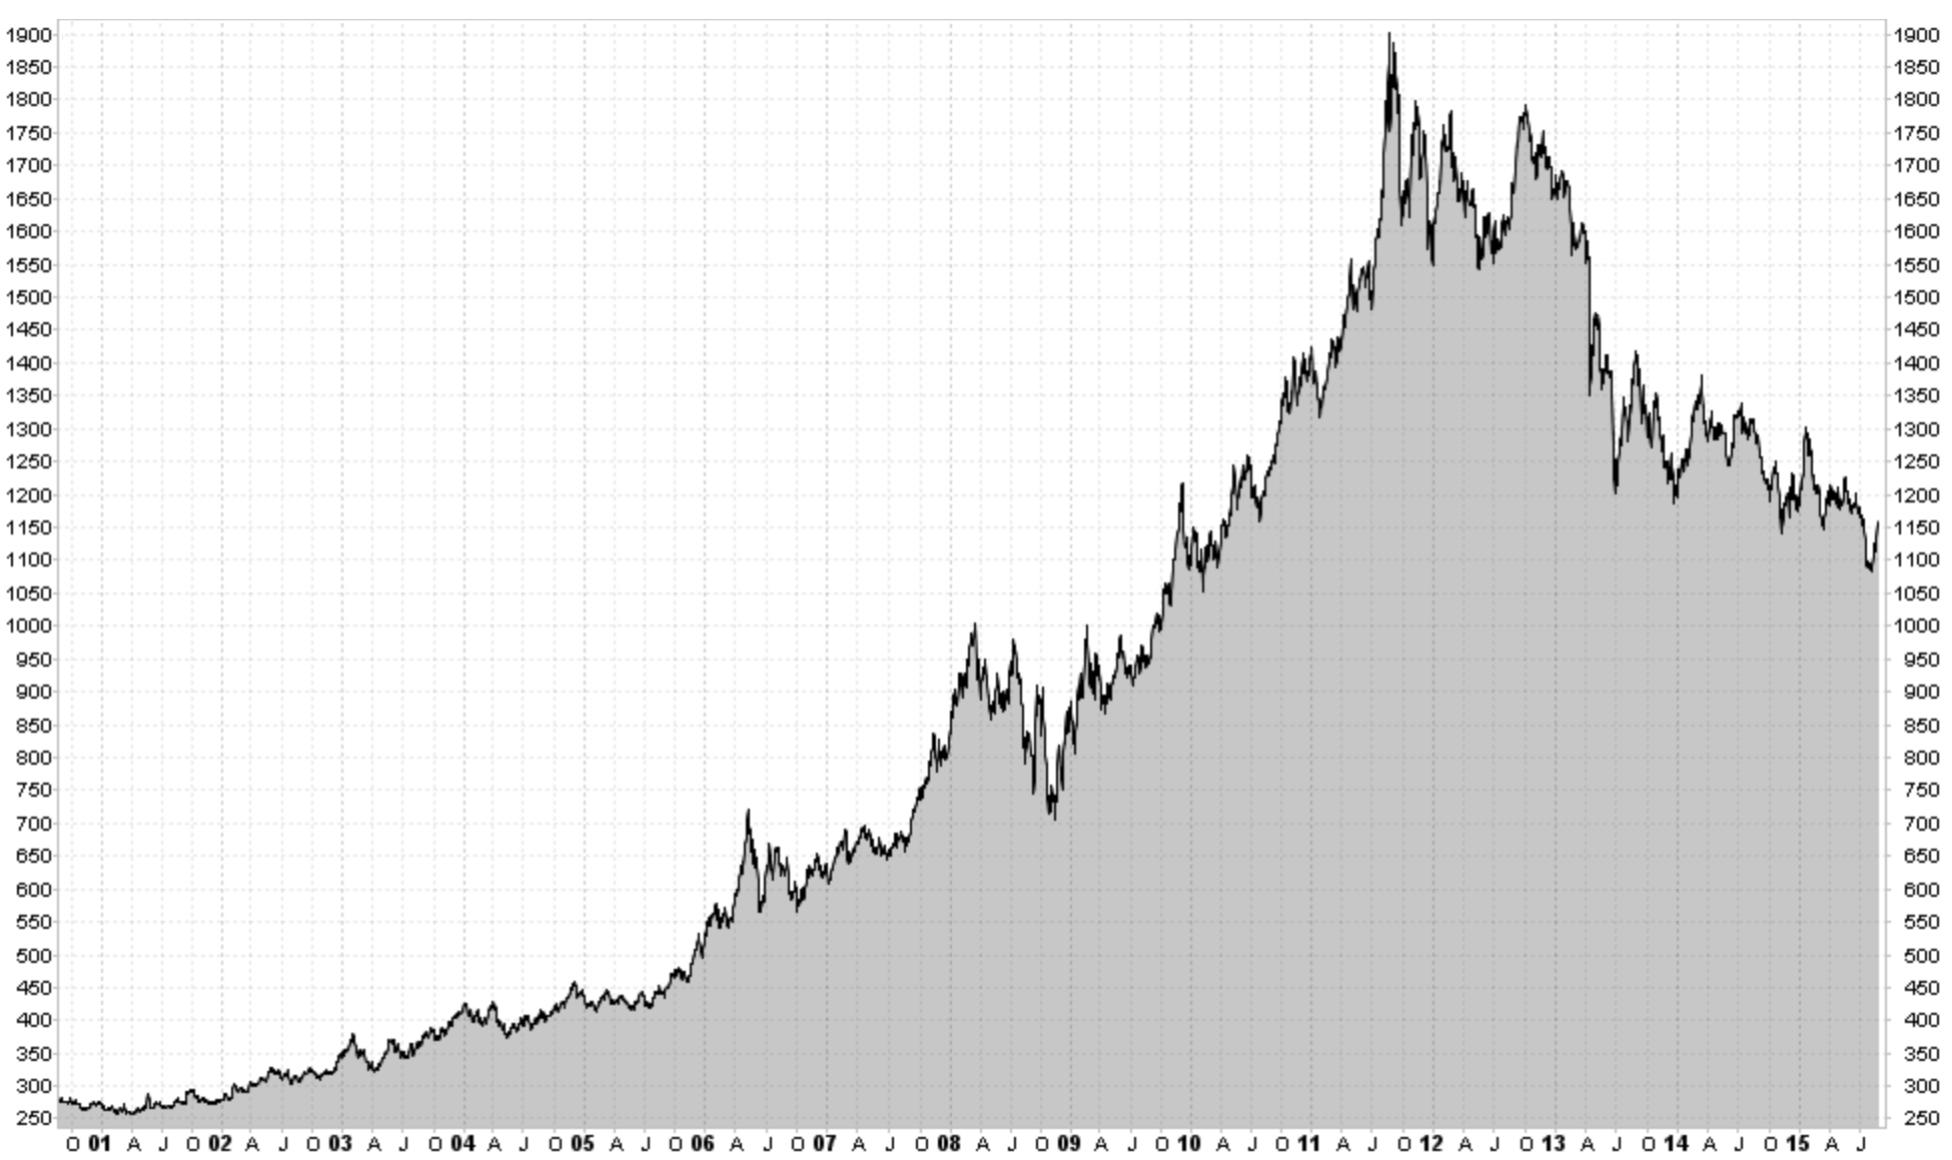 GOLD (USD/OZ)